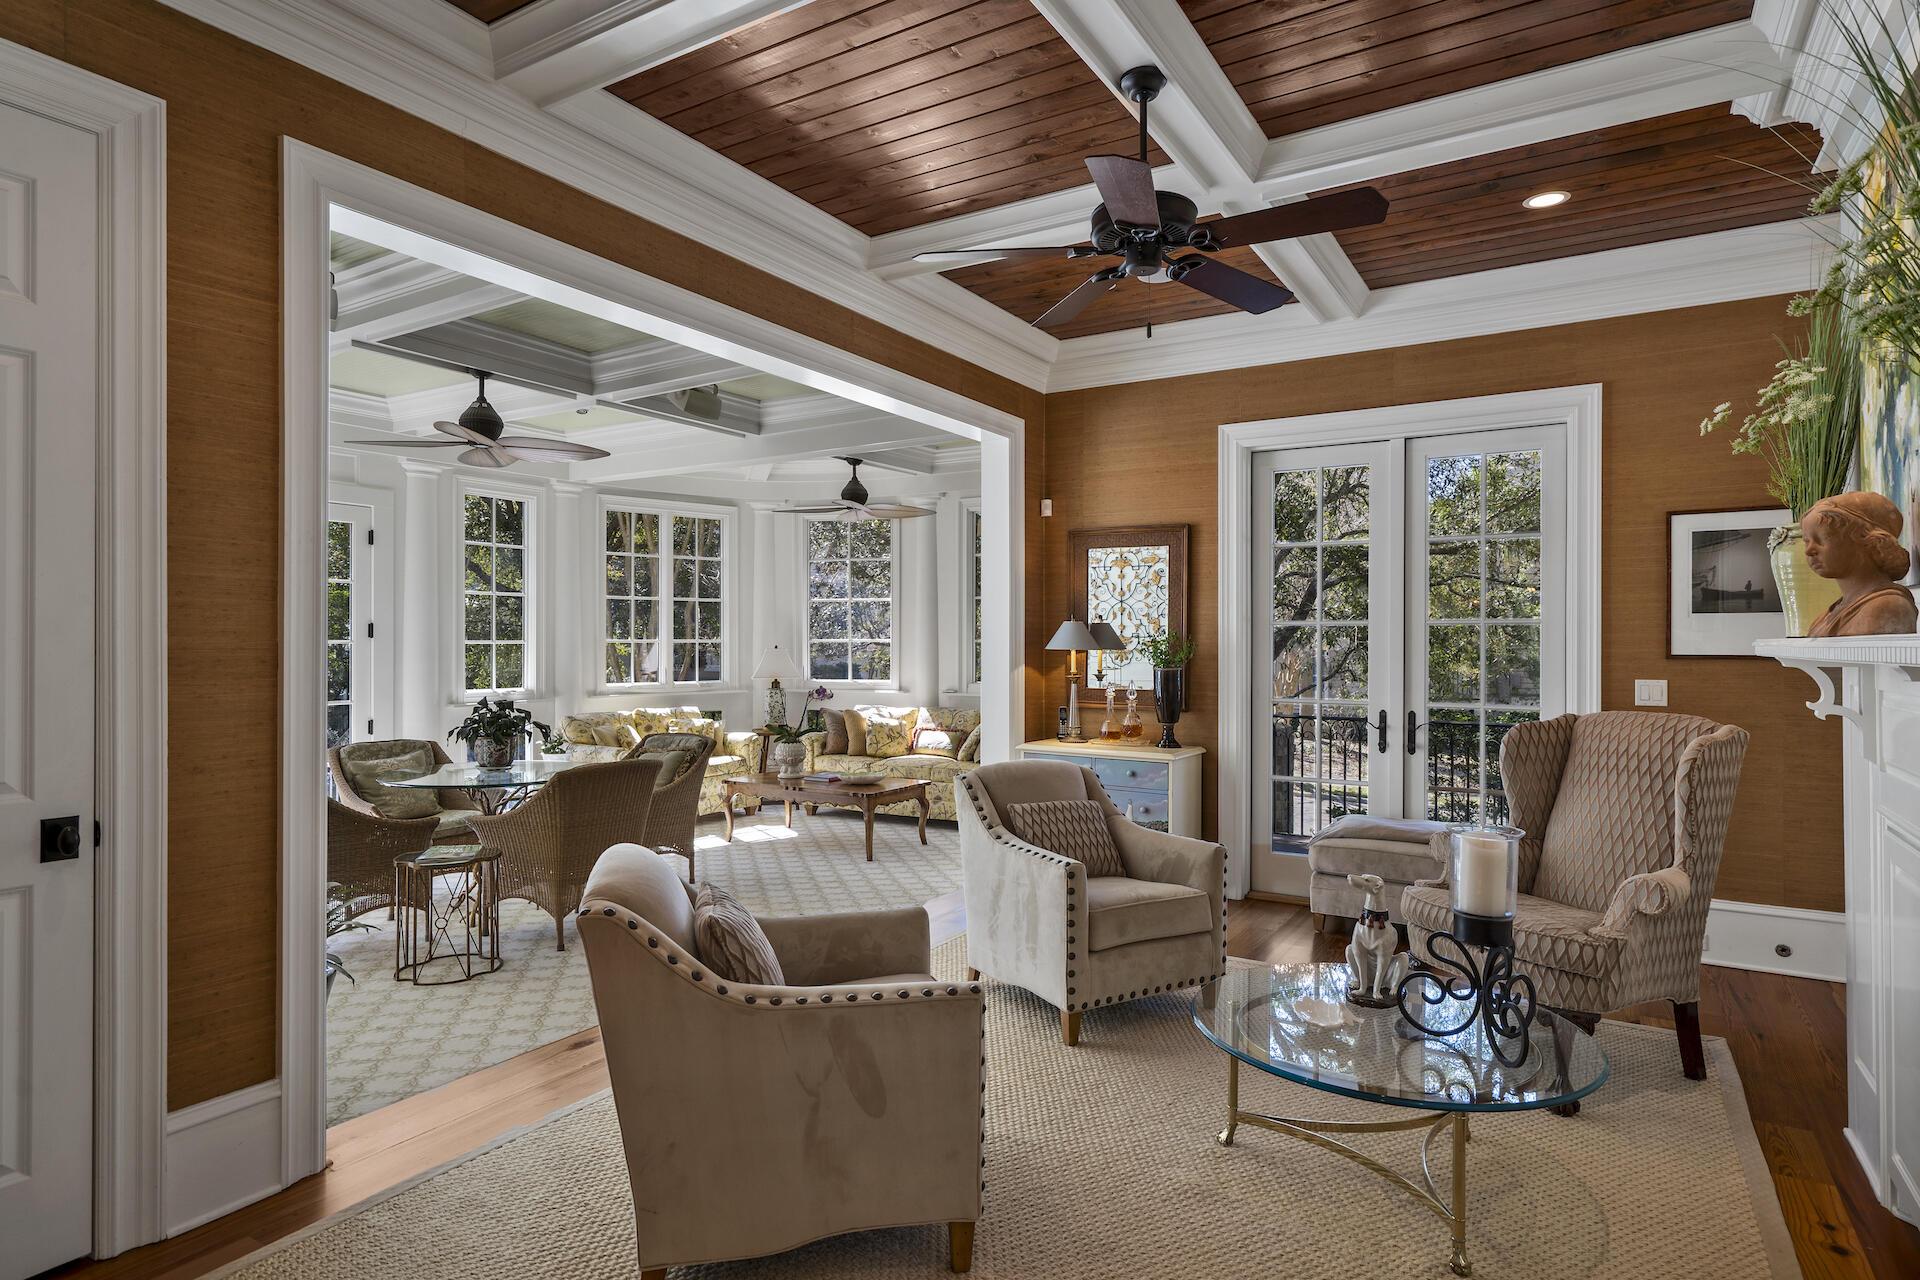 Daniel Island Homes For Sale - 623 Island Park, Charleston, SC - 42